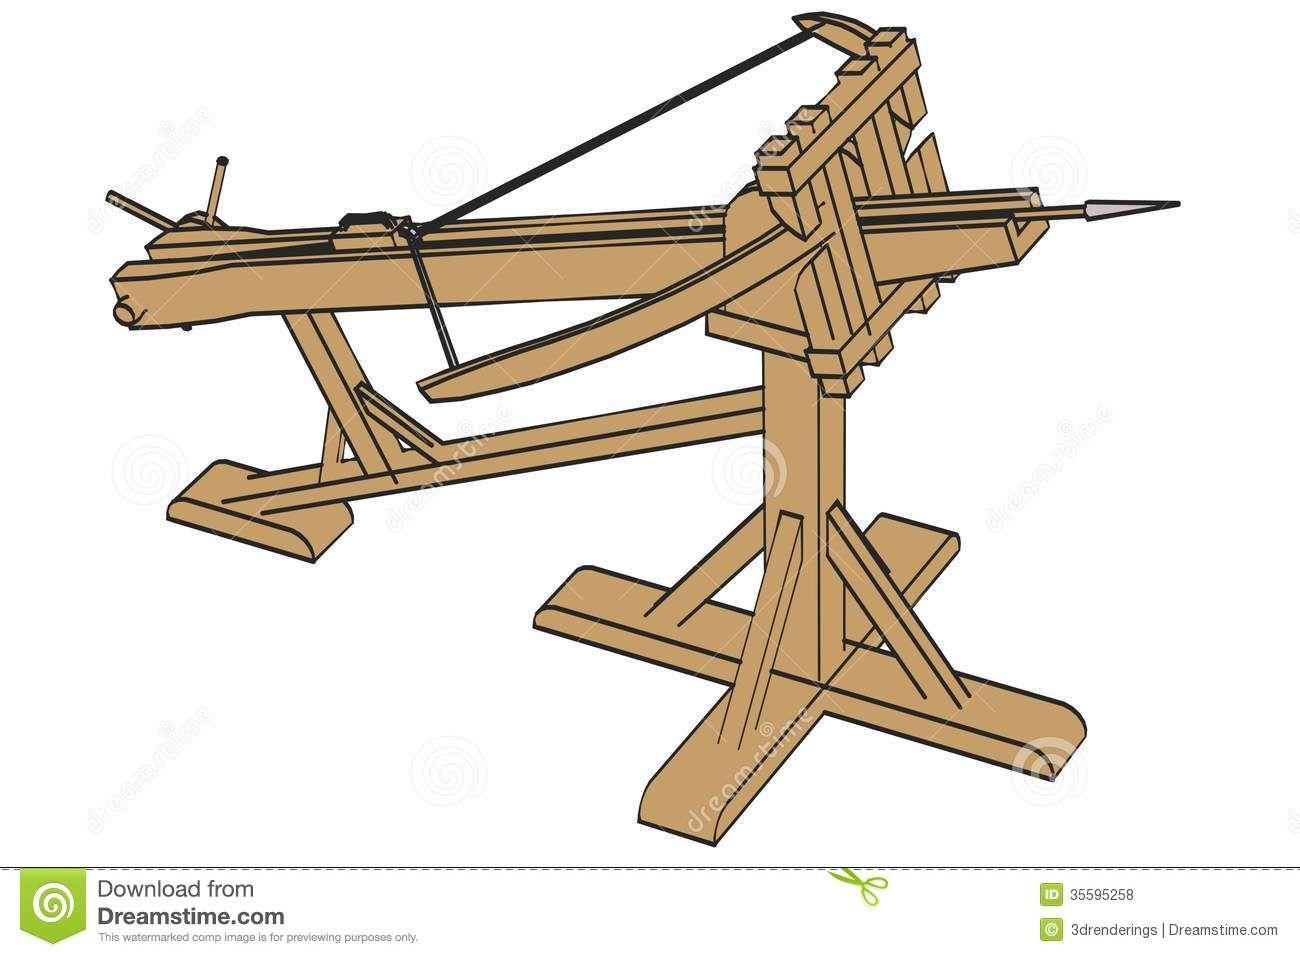 ballista-weapon-cartoon-image-35595258.jpg (1300×957)